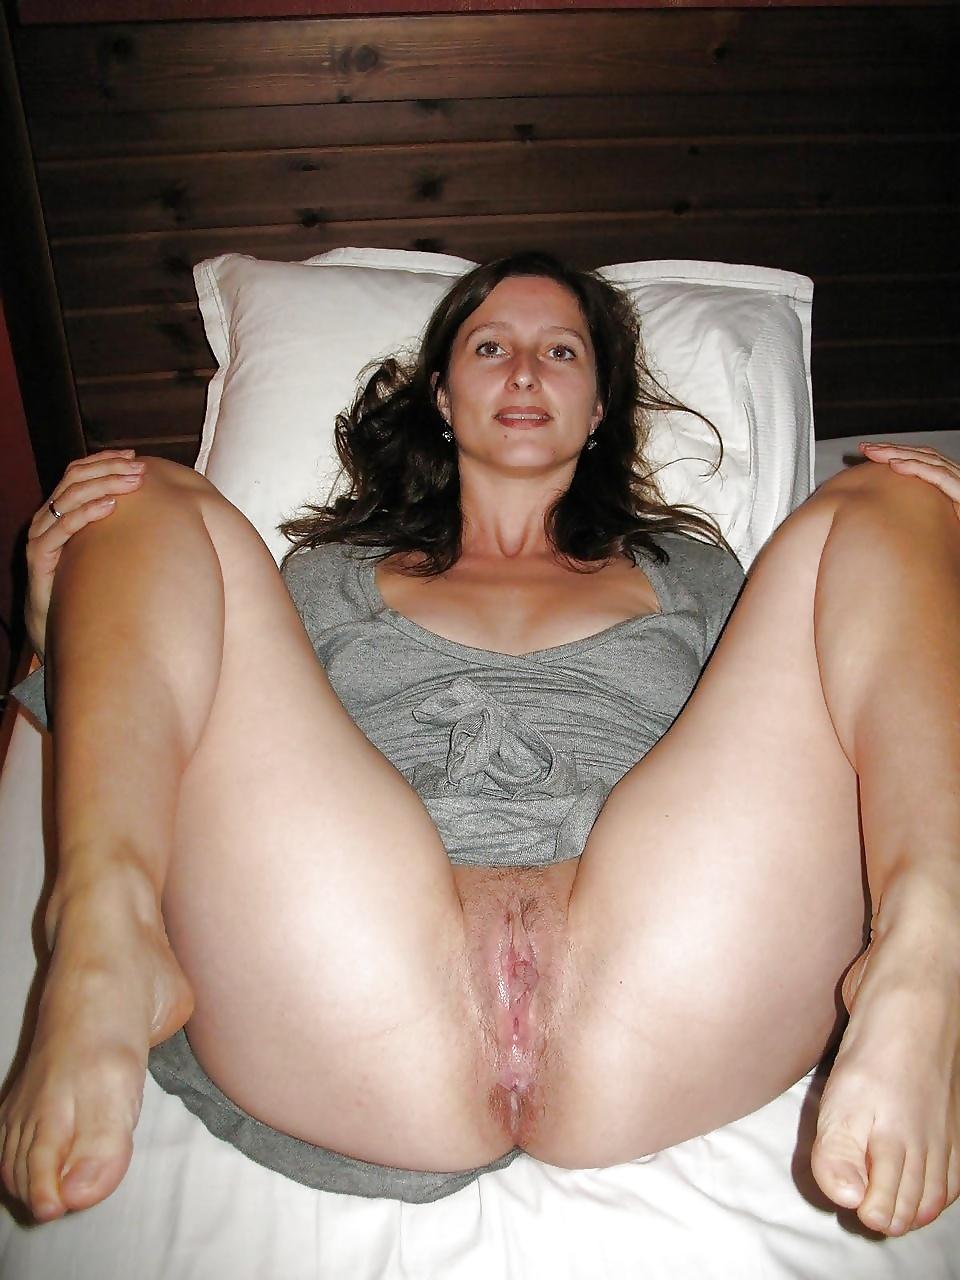 Wifes wet pink pussy spread open hot milf spreading her legs